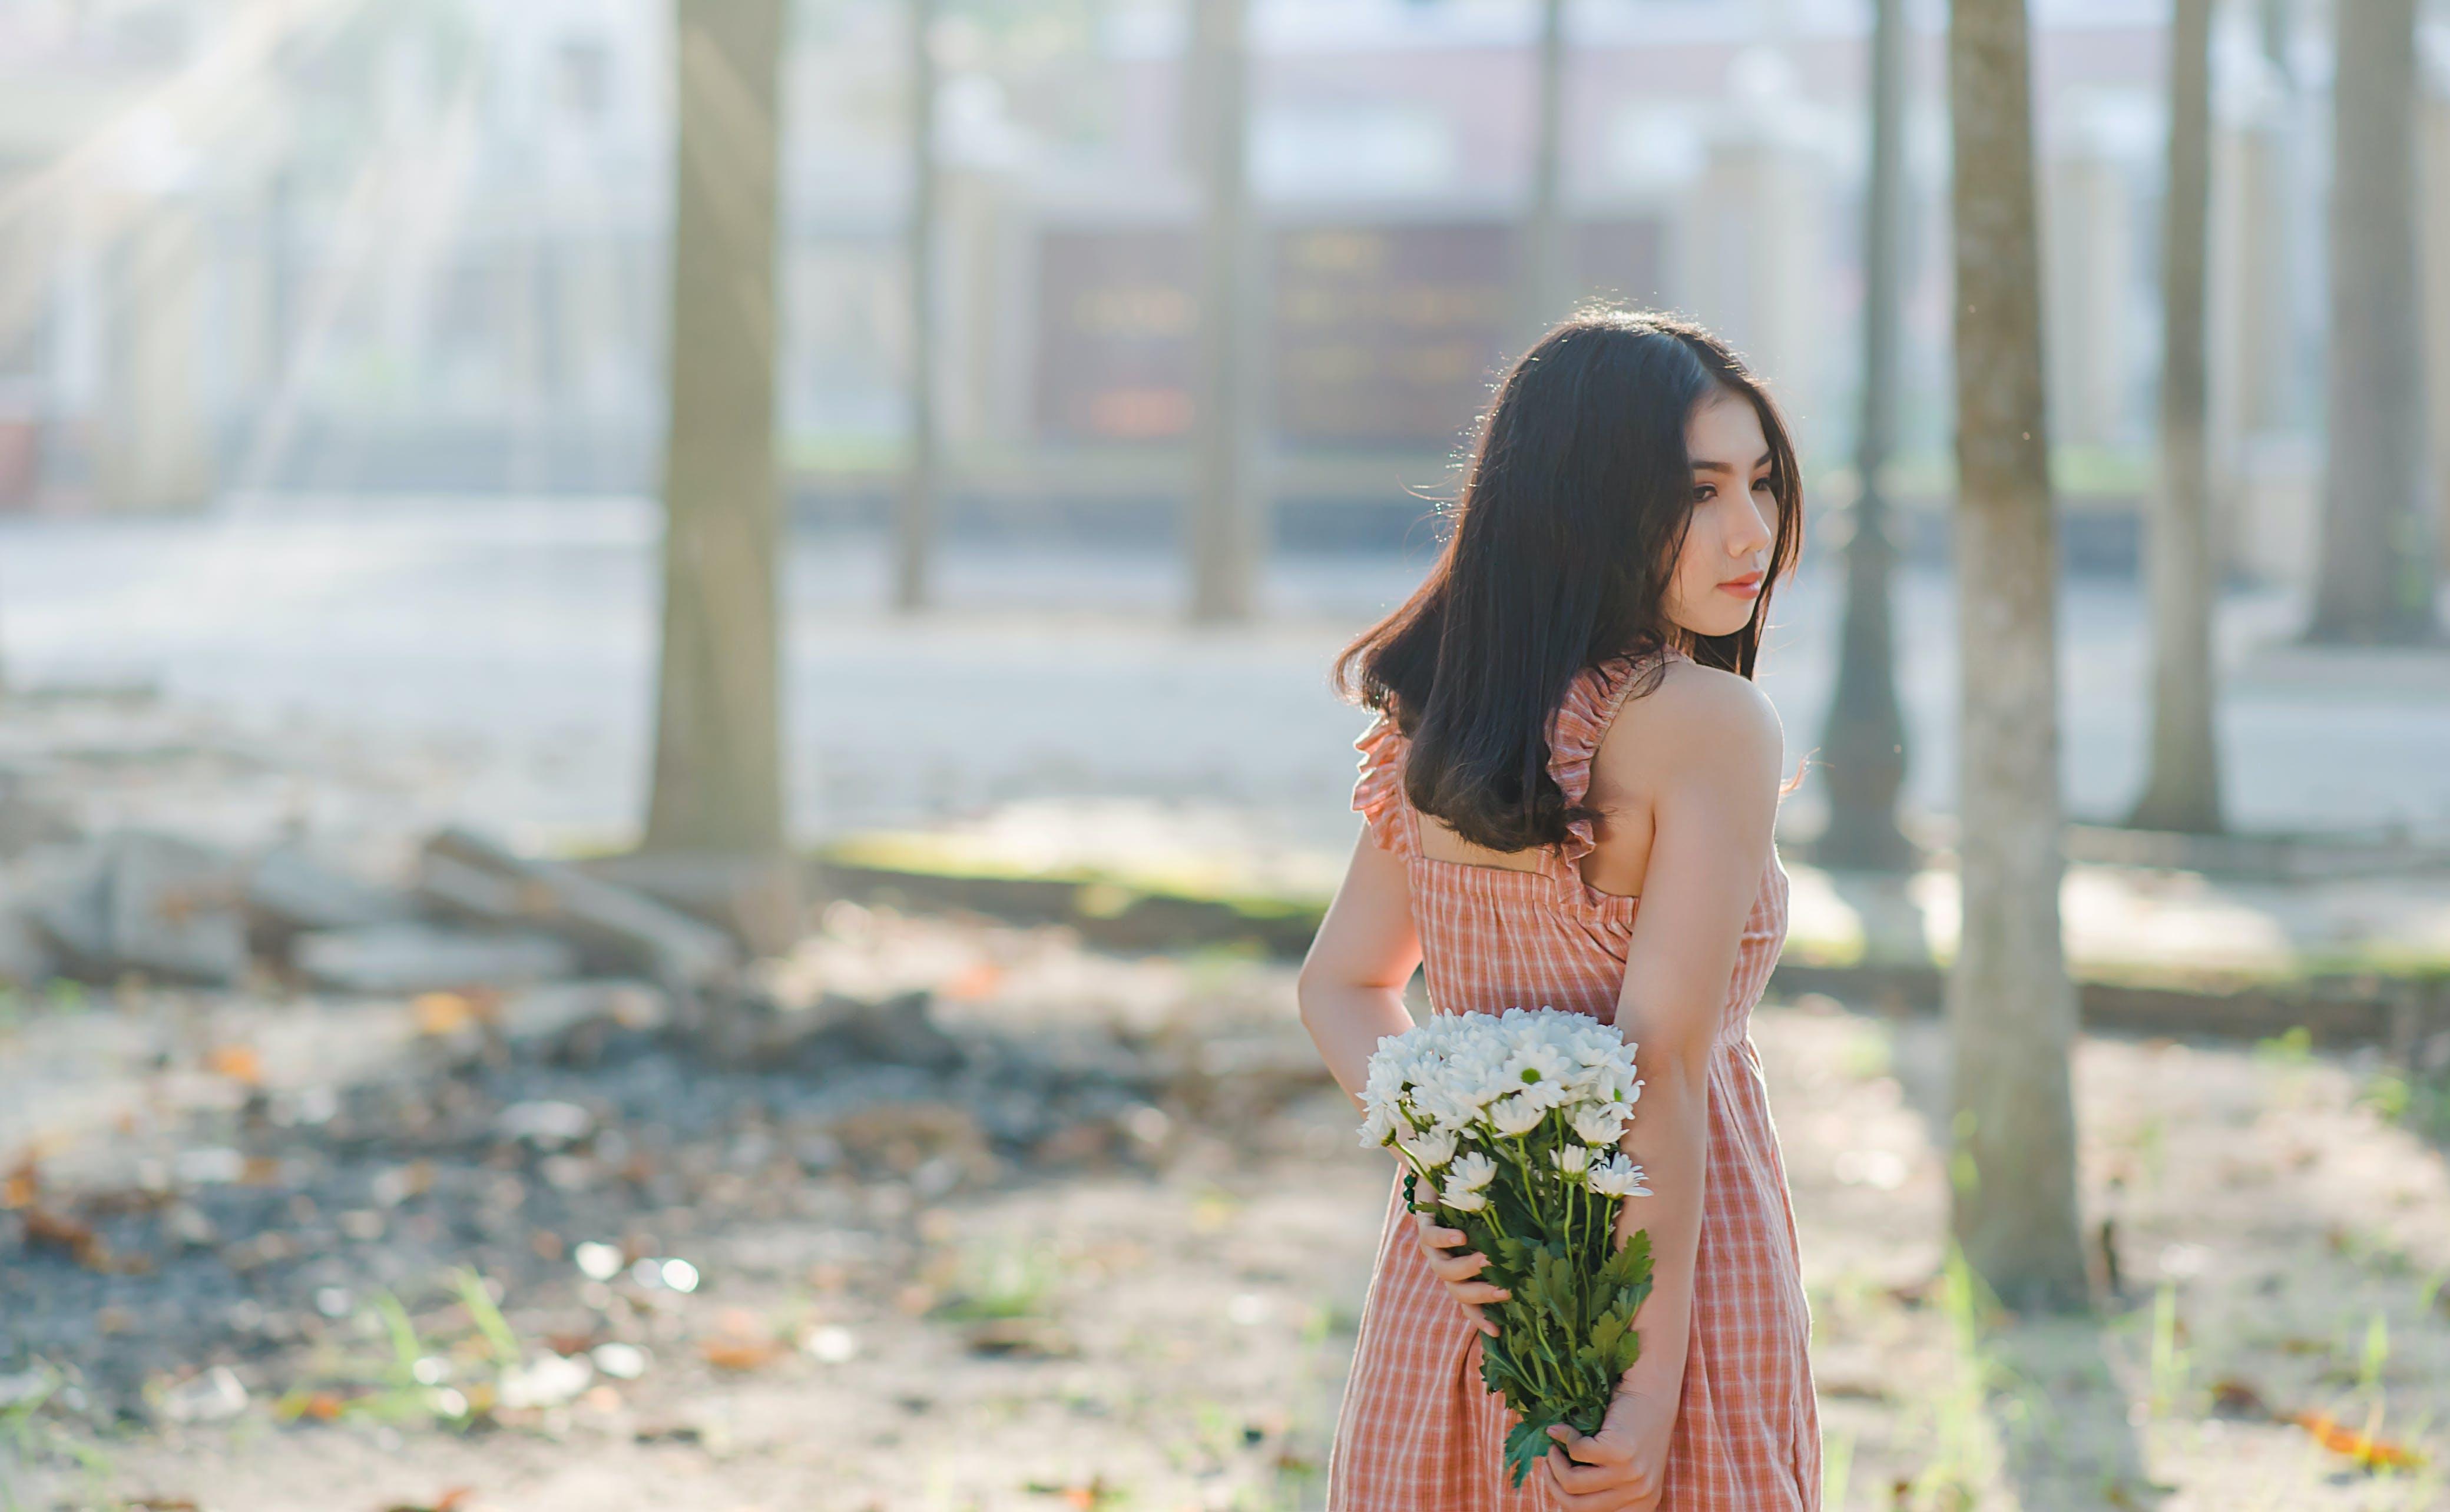 Woman Wearing Orange Sleeveless Dress Holding a Bouquet of Flowers